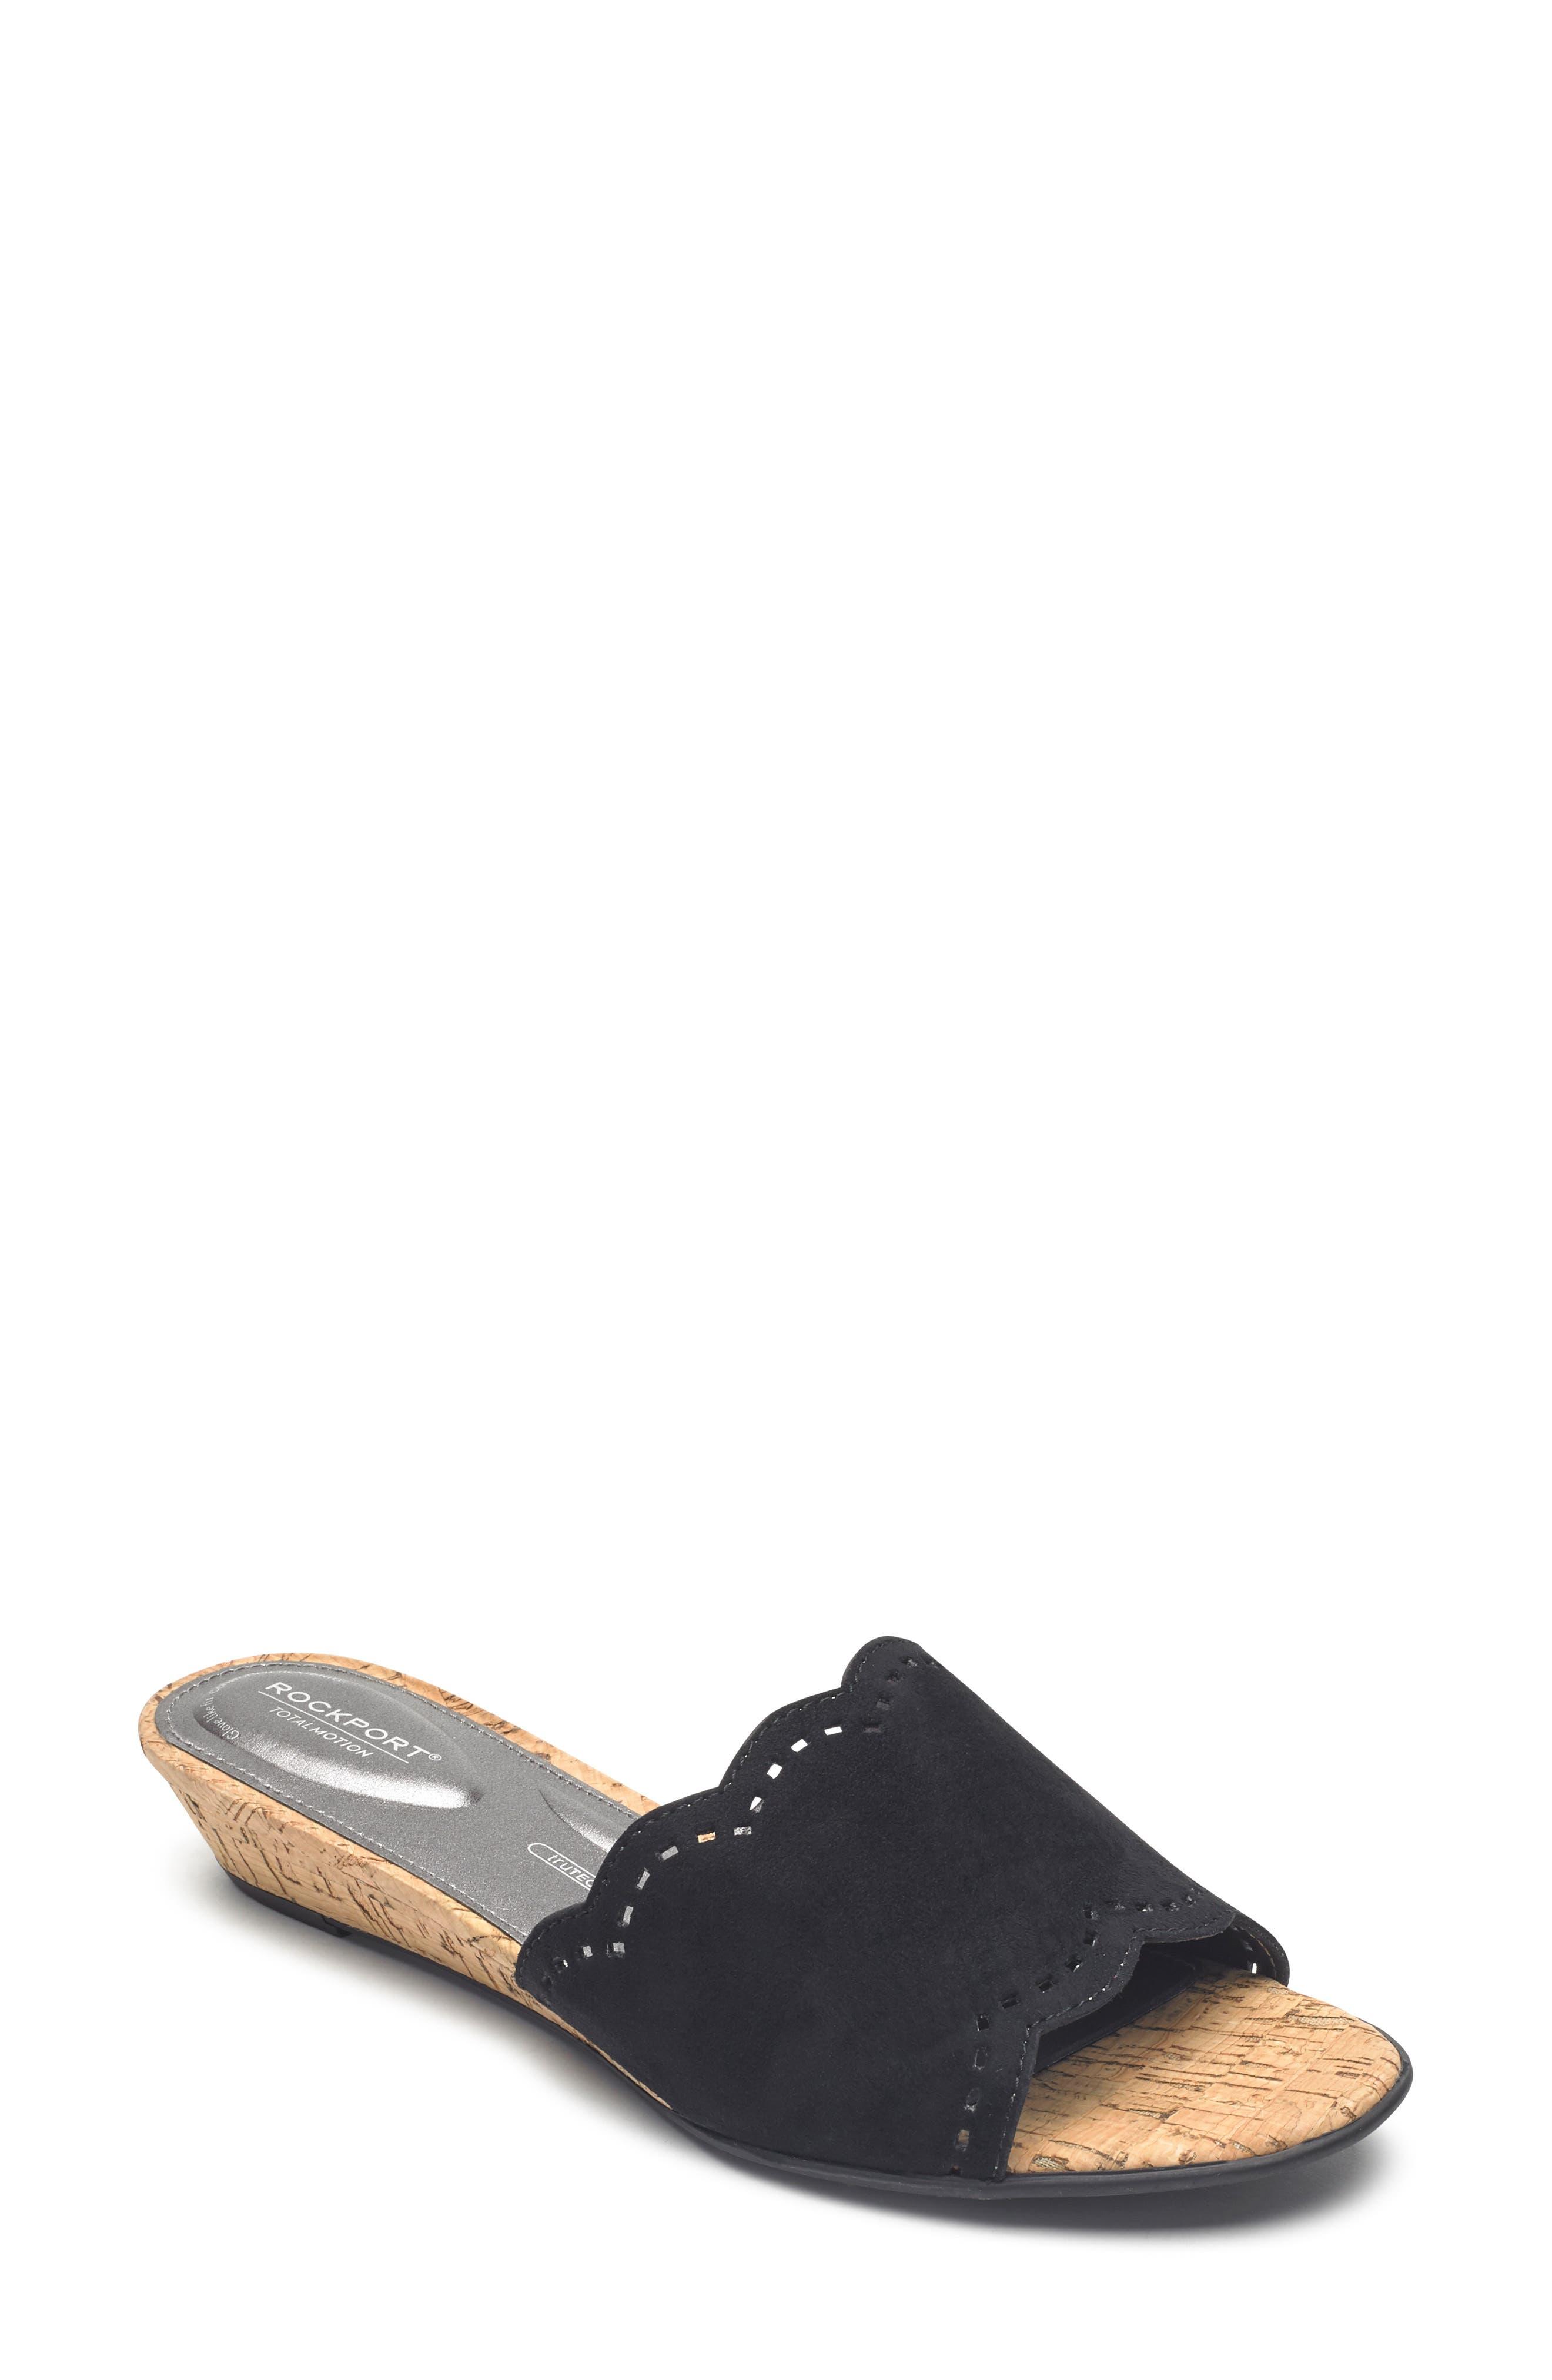 Zandra Total Motion<sup>®</sup> Slide Sandal, Main, color, BLACK SUEDE